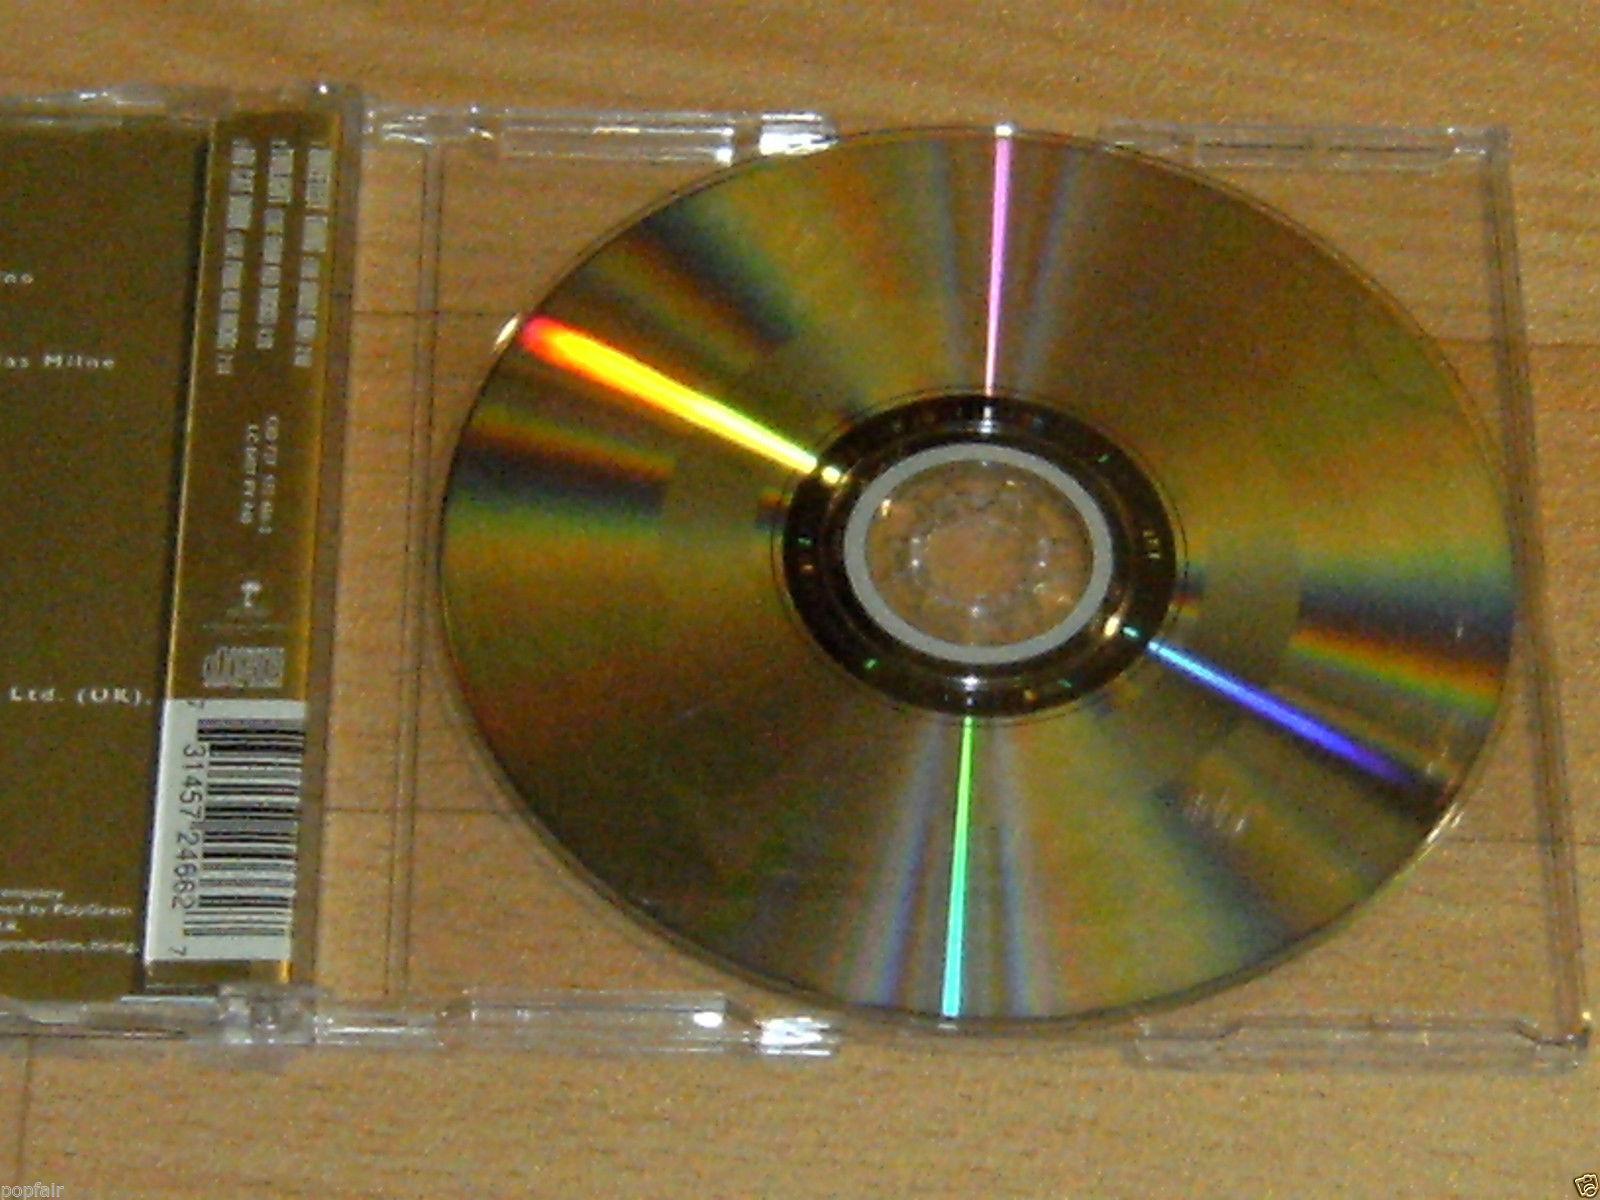 U2 - SWEETEST THING 1998 TWILIGHT LIVE 1983 AN CAT DUBH LIVE 1983 ISLAND CID 727